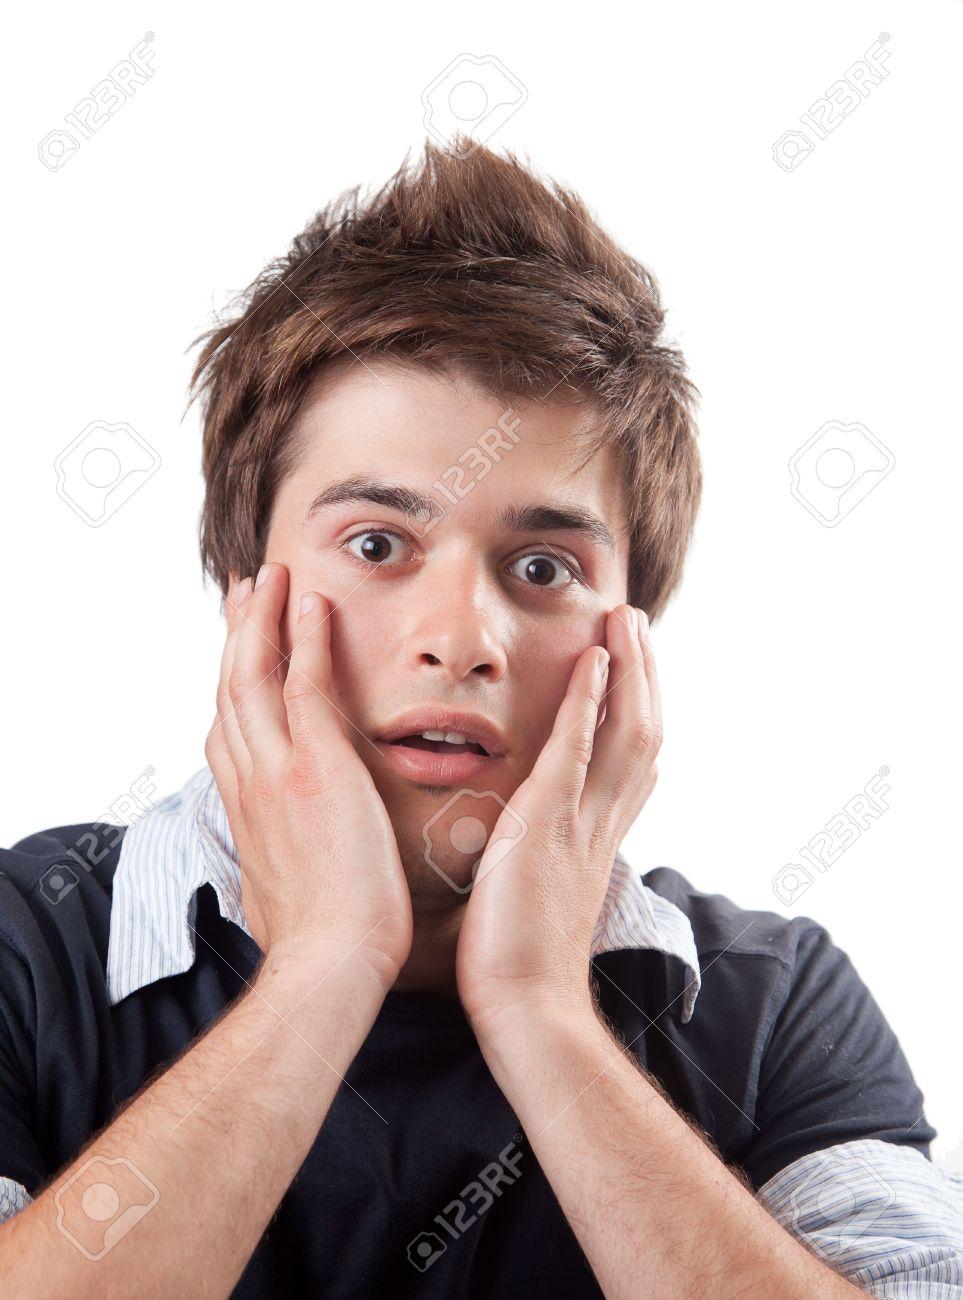 Amazed scared young man isolated on white background Stock Photo - 10059760